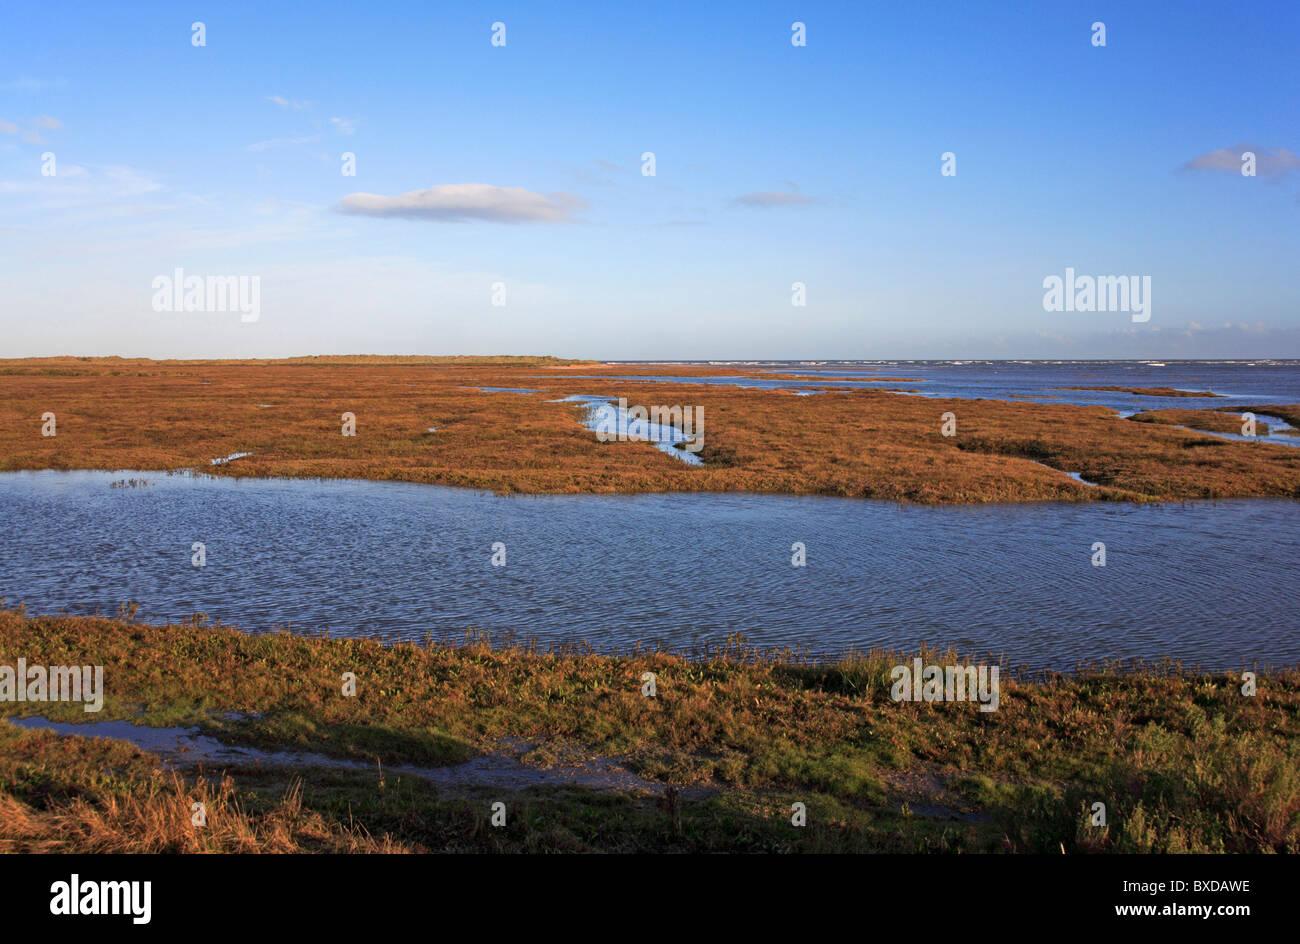 Saltings at high tide on the North Norfolk coast at Thornham, Norfolk, England, United Kingdom. Stock Photo